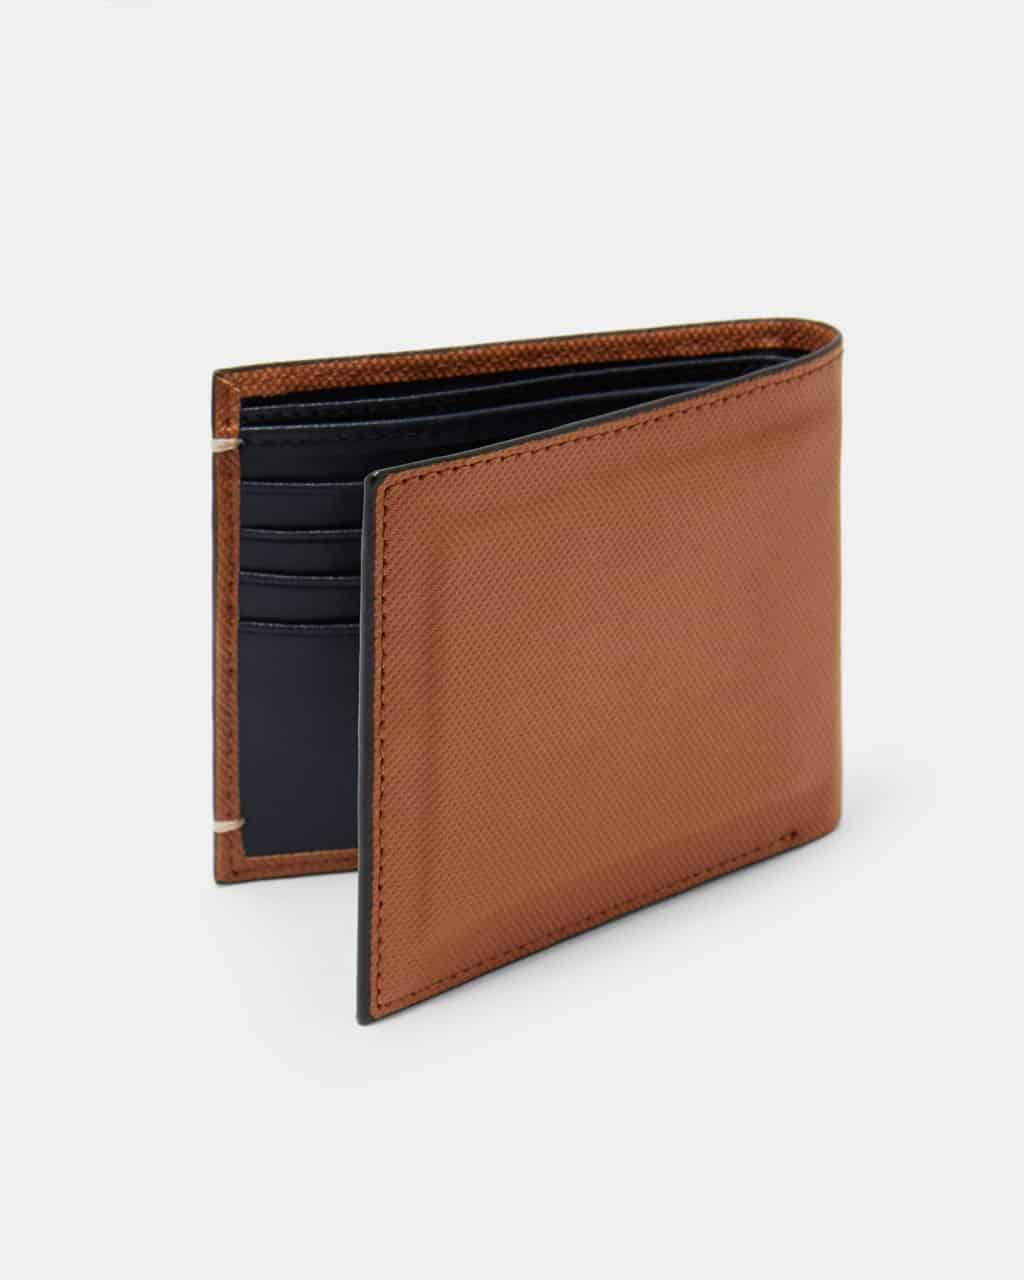 b72b9da27 ted baker london stormz tan perforated leather bi-fold wallet